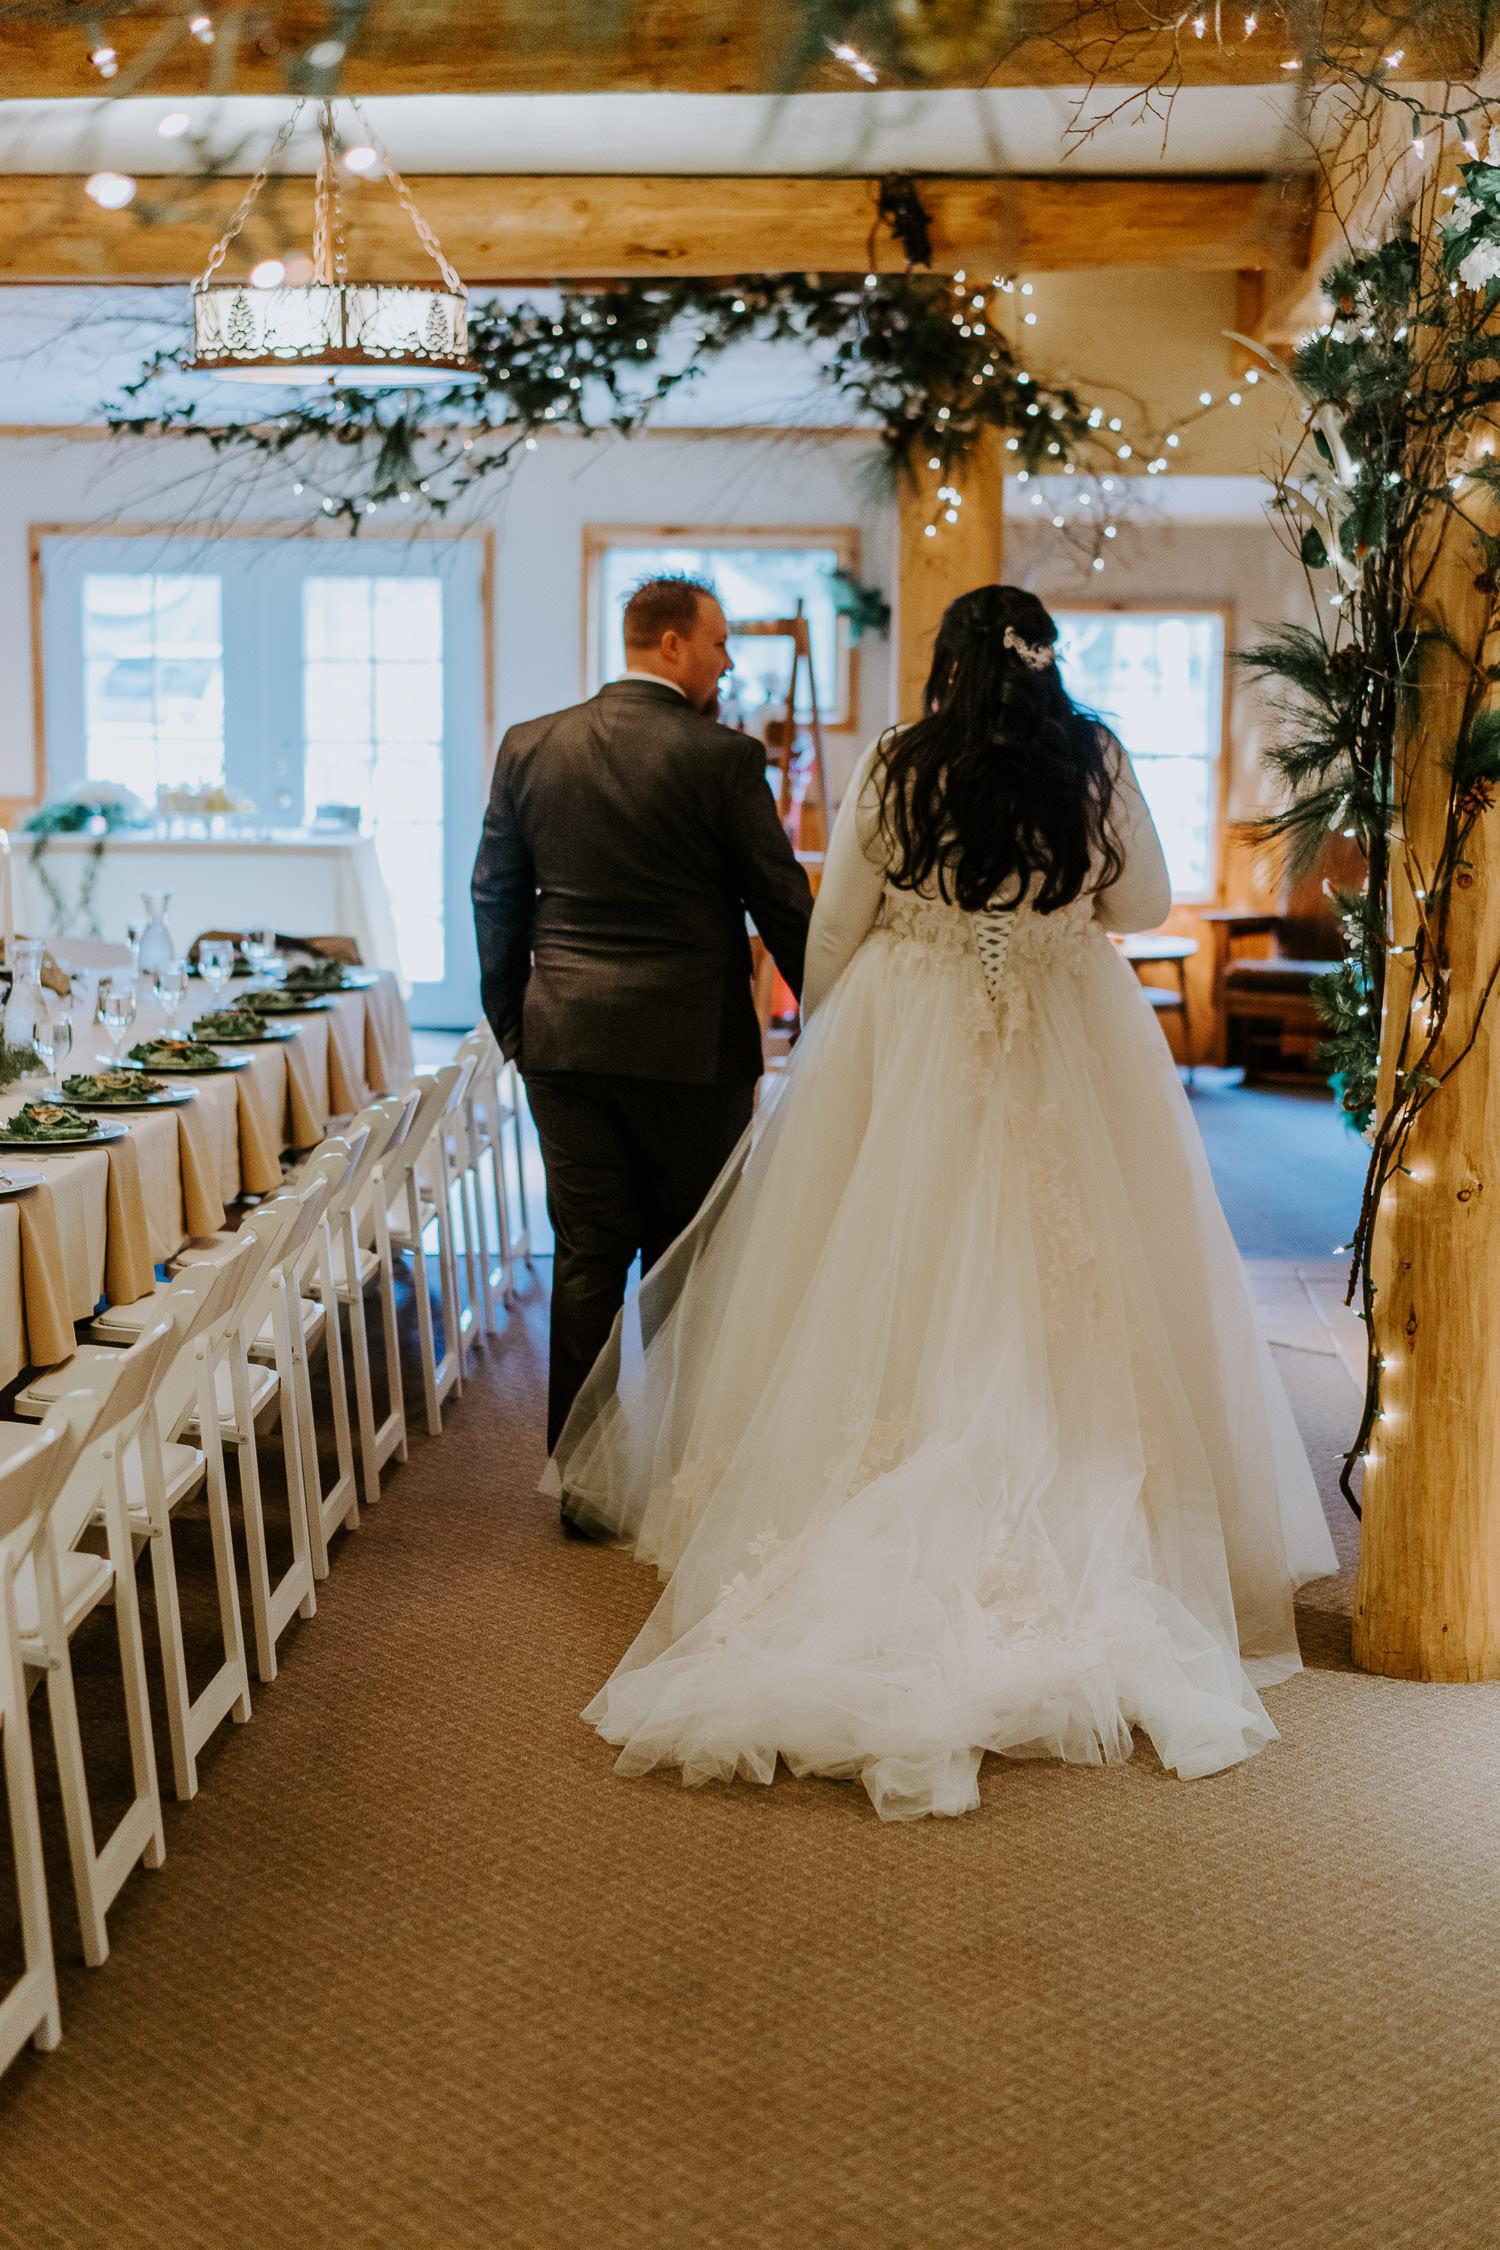 daven haven lodge, woodsy wedding ceremony details